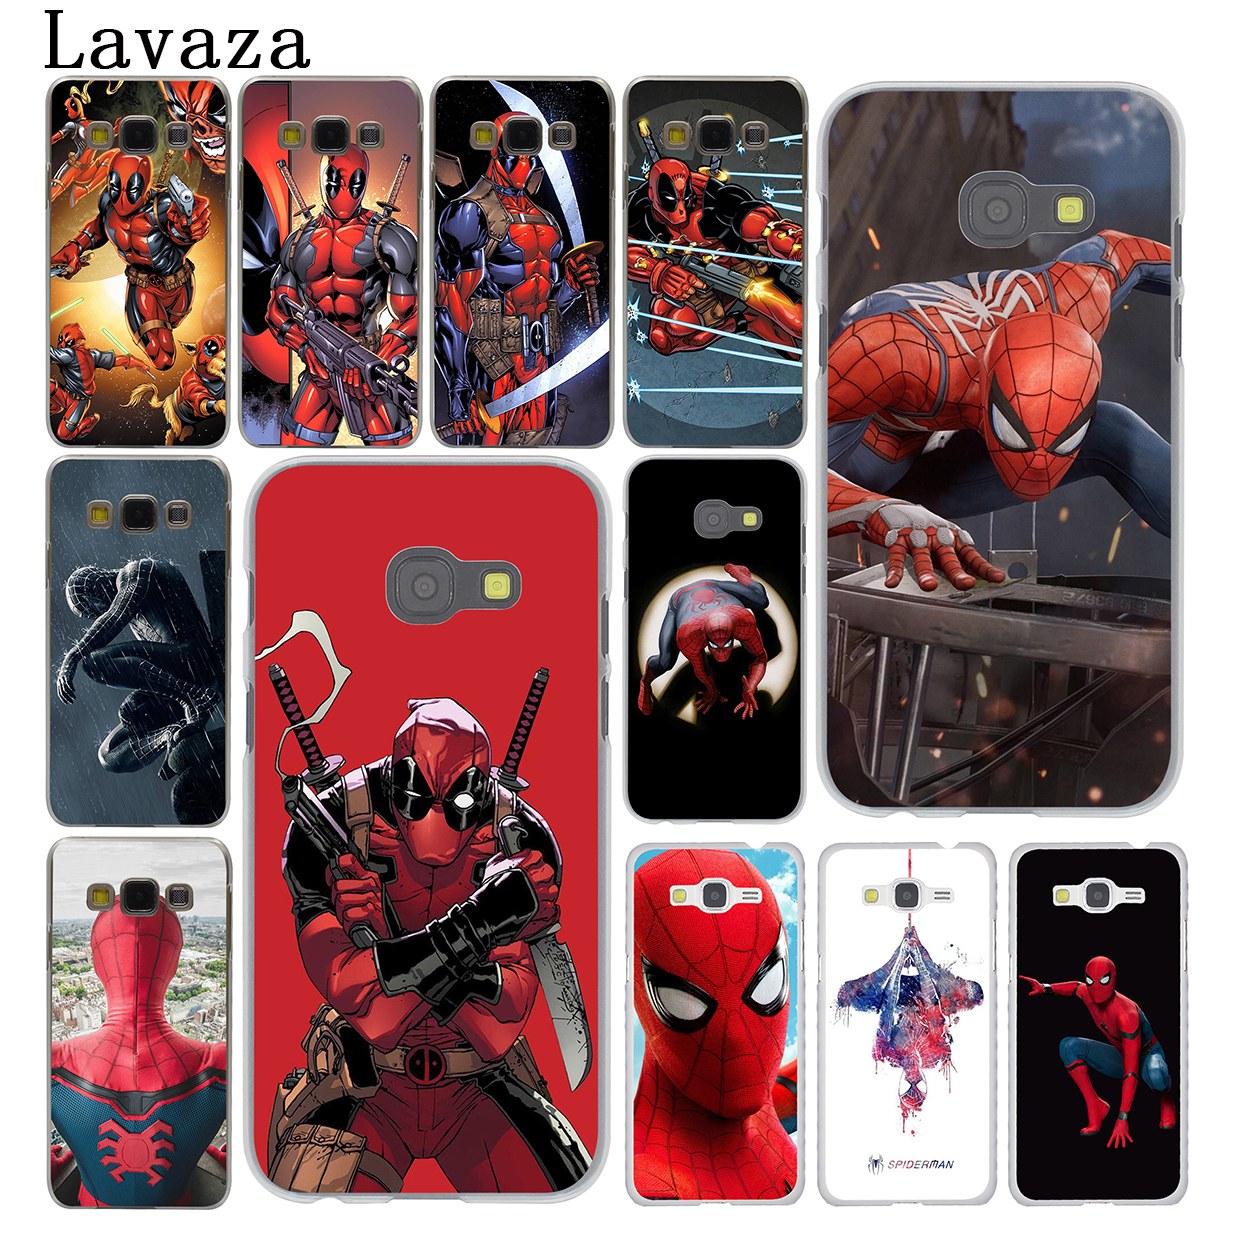 Lavaza <font><b>Spider</b></font> <font><b>Man</b></font> Deadpool <font><b>Spider</b></font>-<font><b>Man</b></font> Marve <font><b>Case</b></font> for <font><b>Samsung</b></font> <font><b>Galaxy</b></font> A8 A7 A3 A5 2015 2016 2017 2018 Note 8 5 4 3 Grand Prime <font><b>2</b></font>